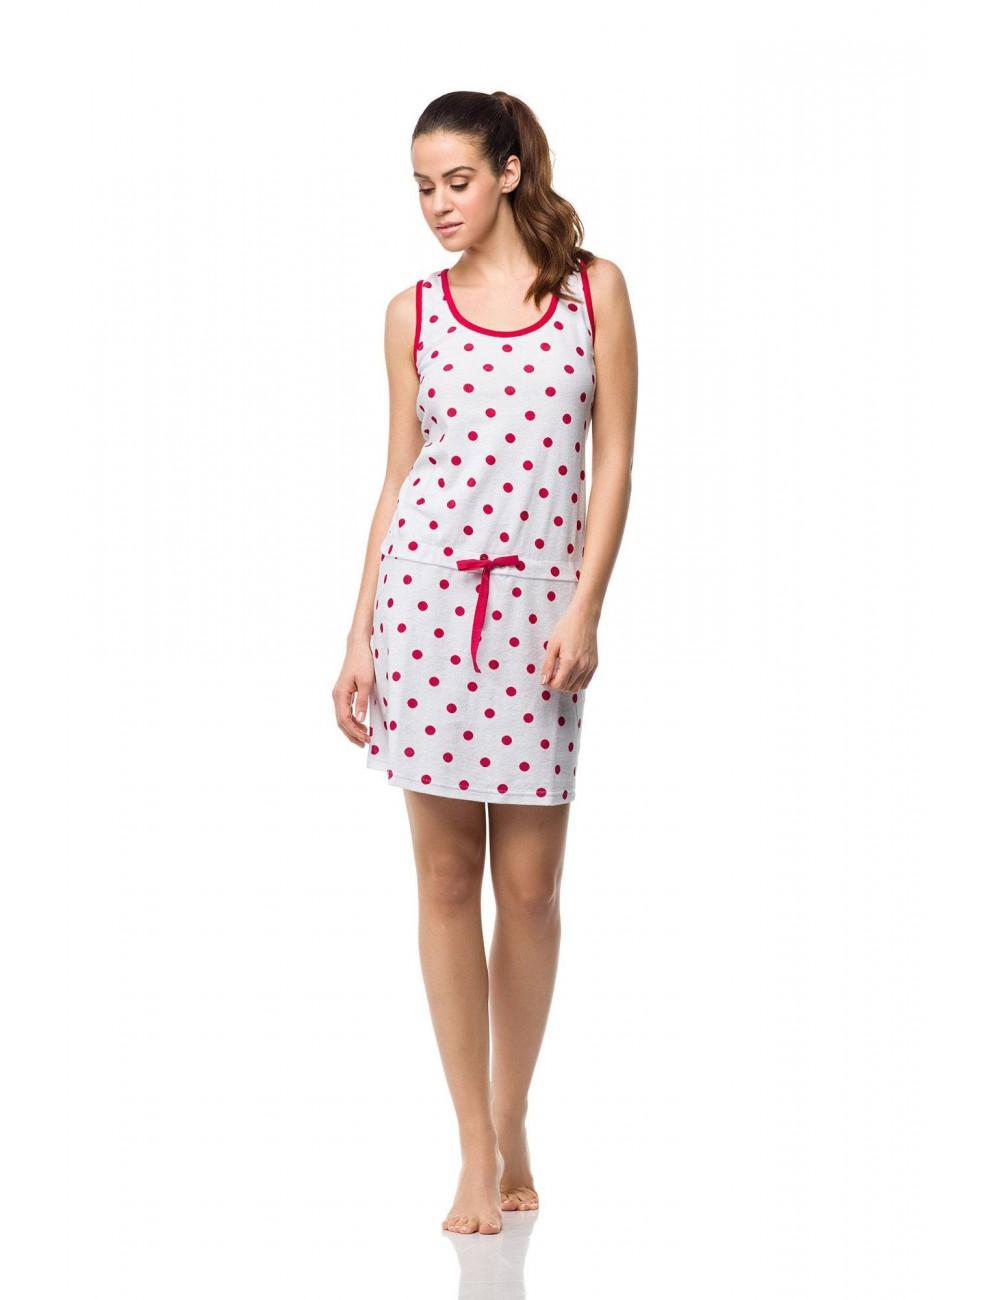 7c3f2c0521ca Φόρεμα Παραλίας Πετσετέ-4100